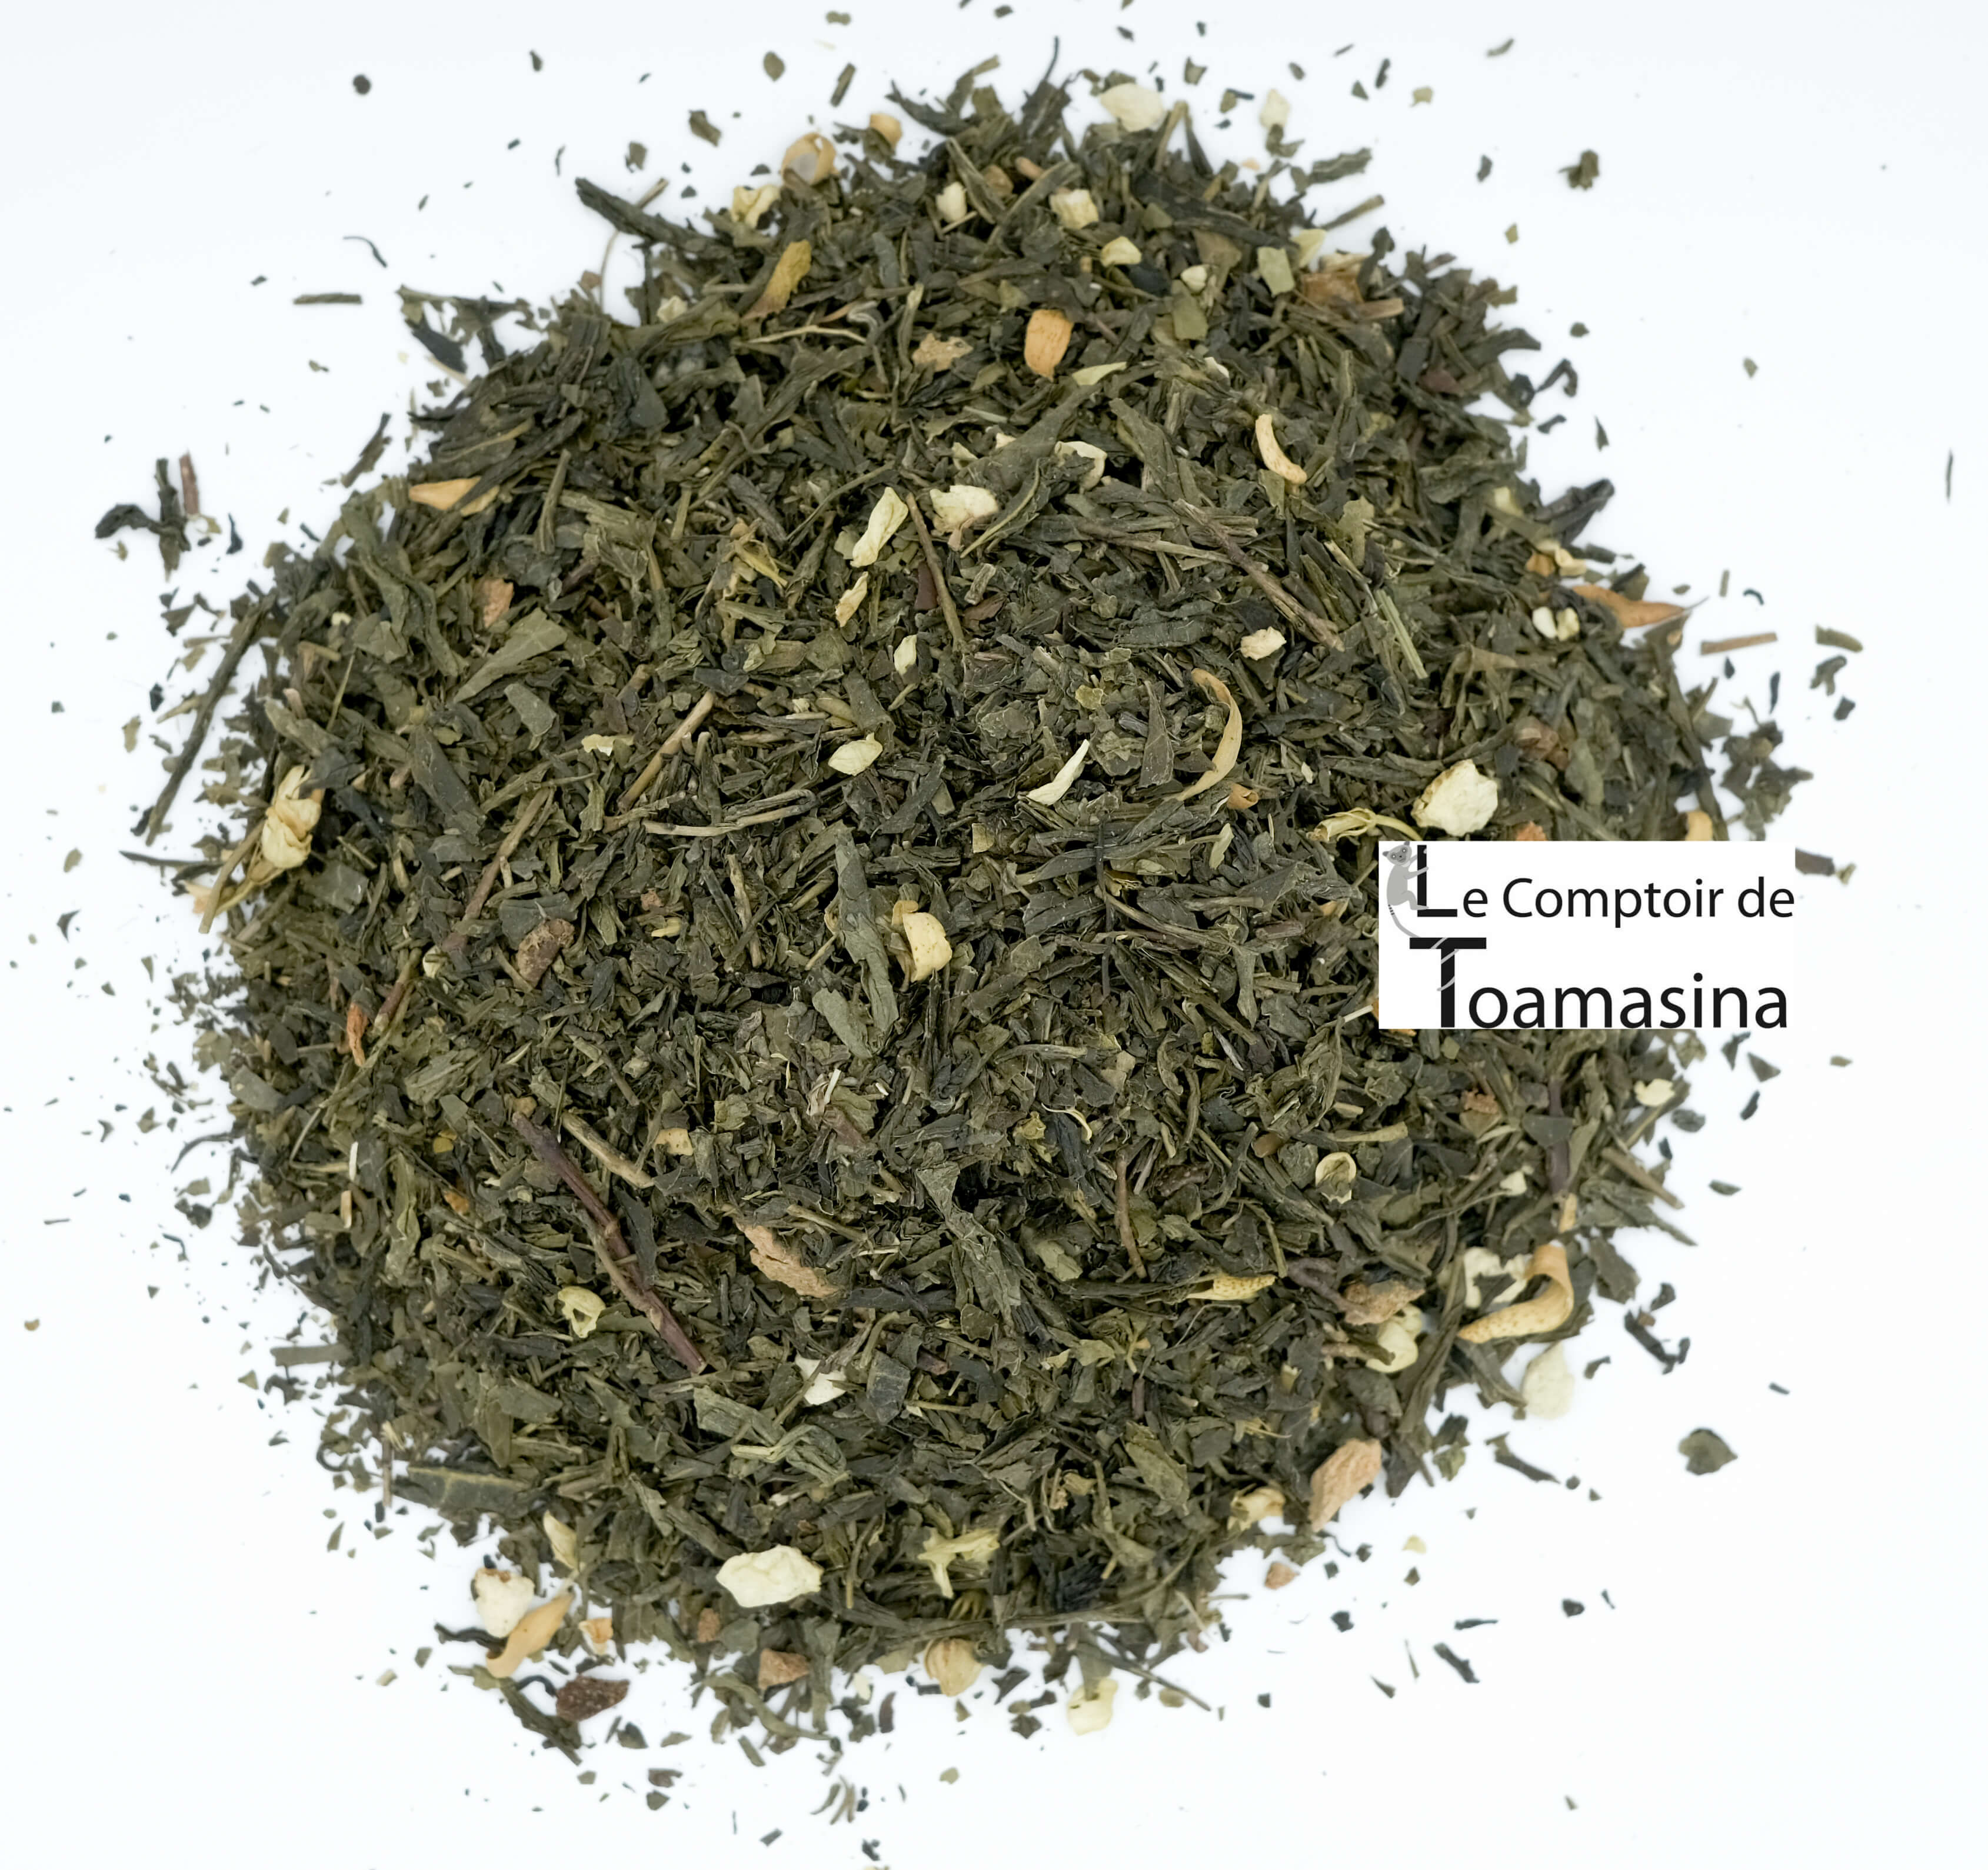 Thé Vert parfumé à lorange carioca, acheter du thé vert